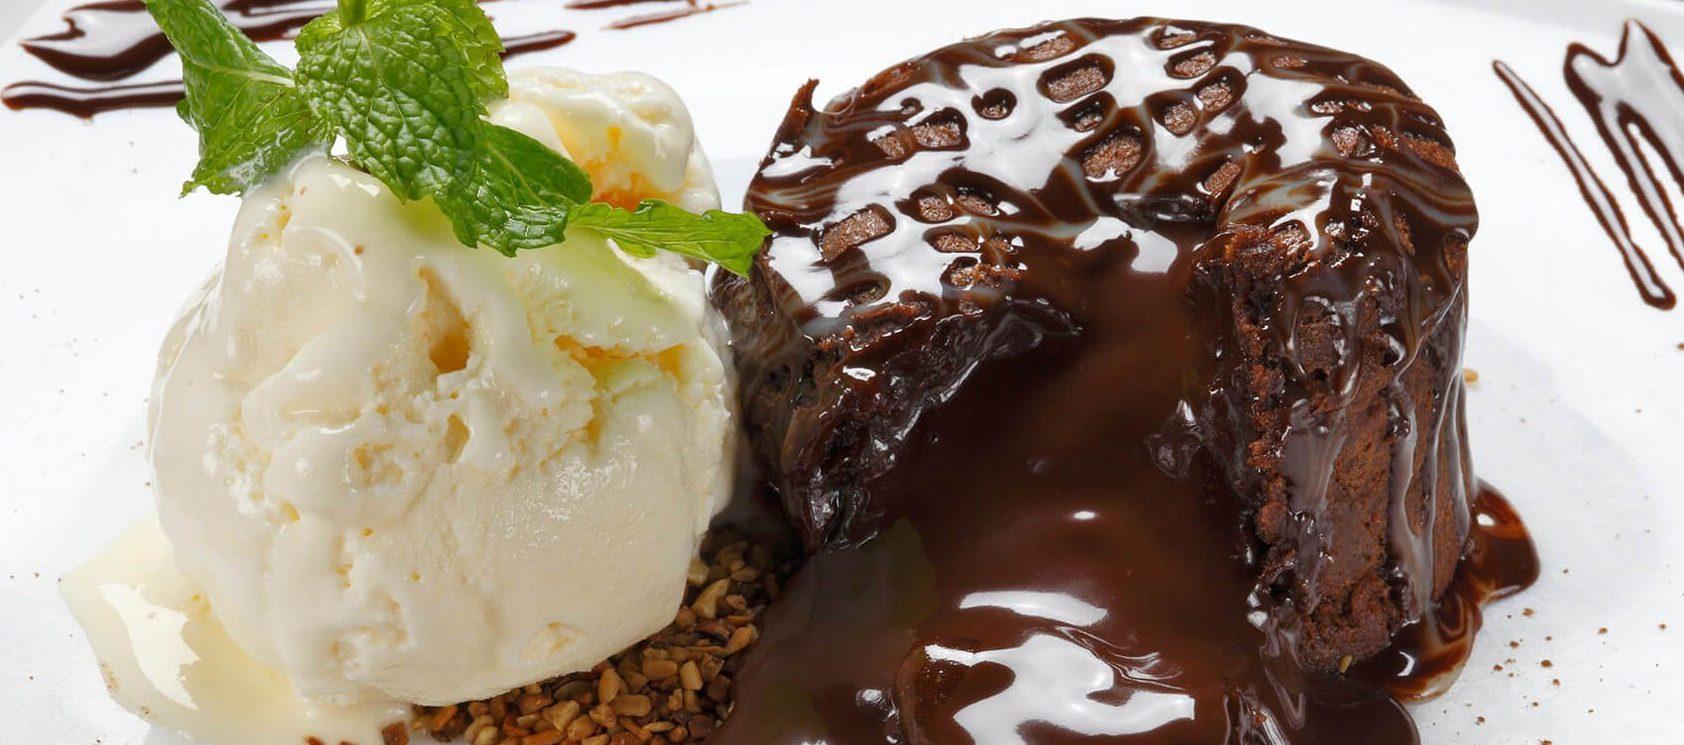 High protein, dairy ice cream, ice cream, ice cream crystal, stabilizers ice cream, vegan ice cream, premium ice cream, low cost ice cream, economic ice cream, fortified ice cream